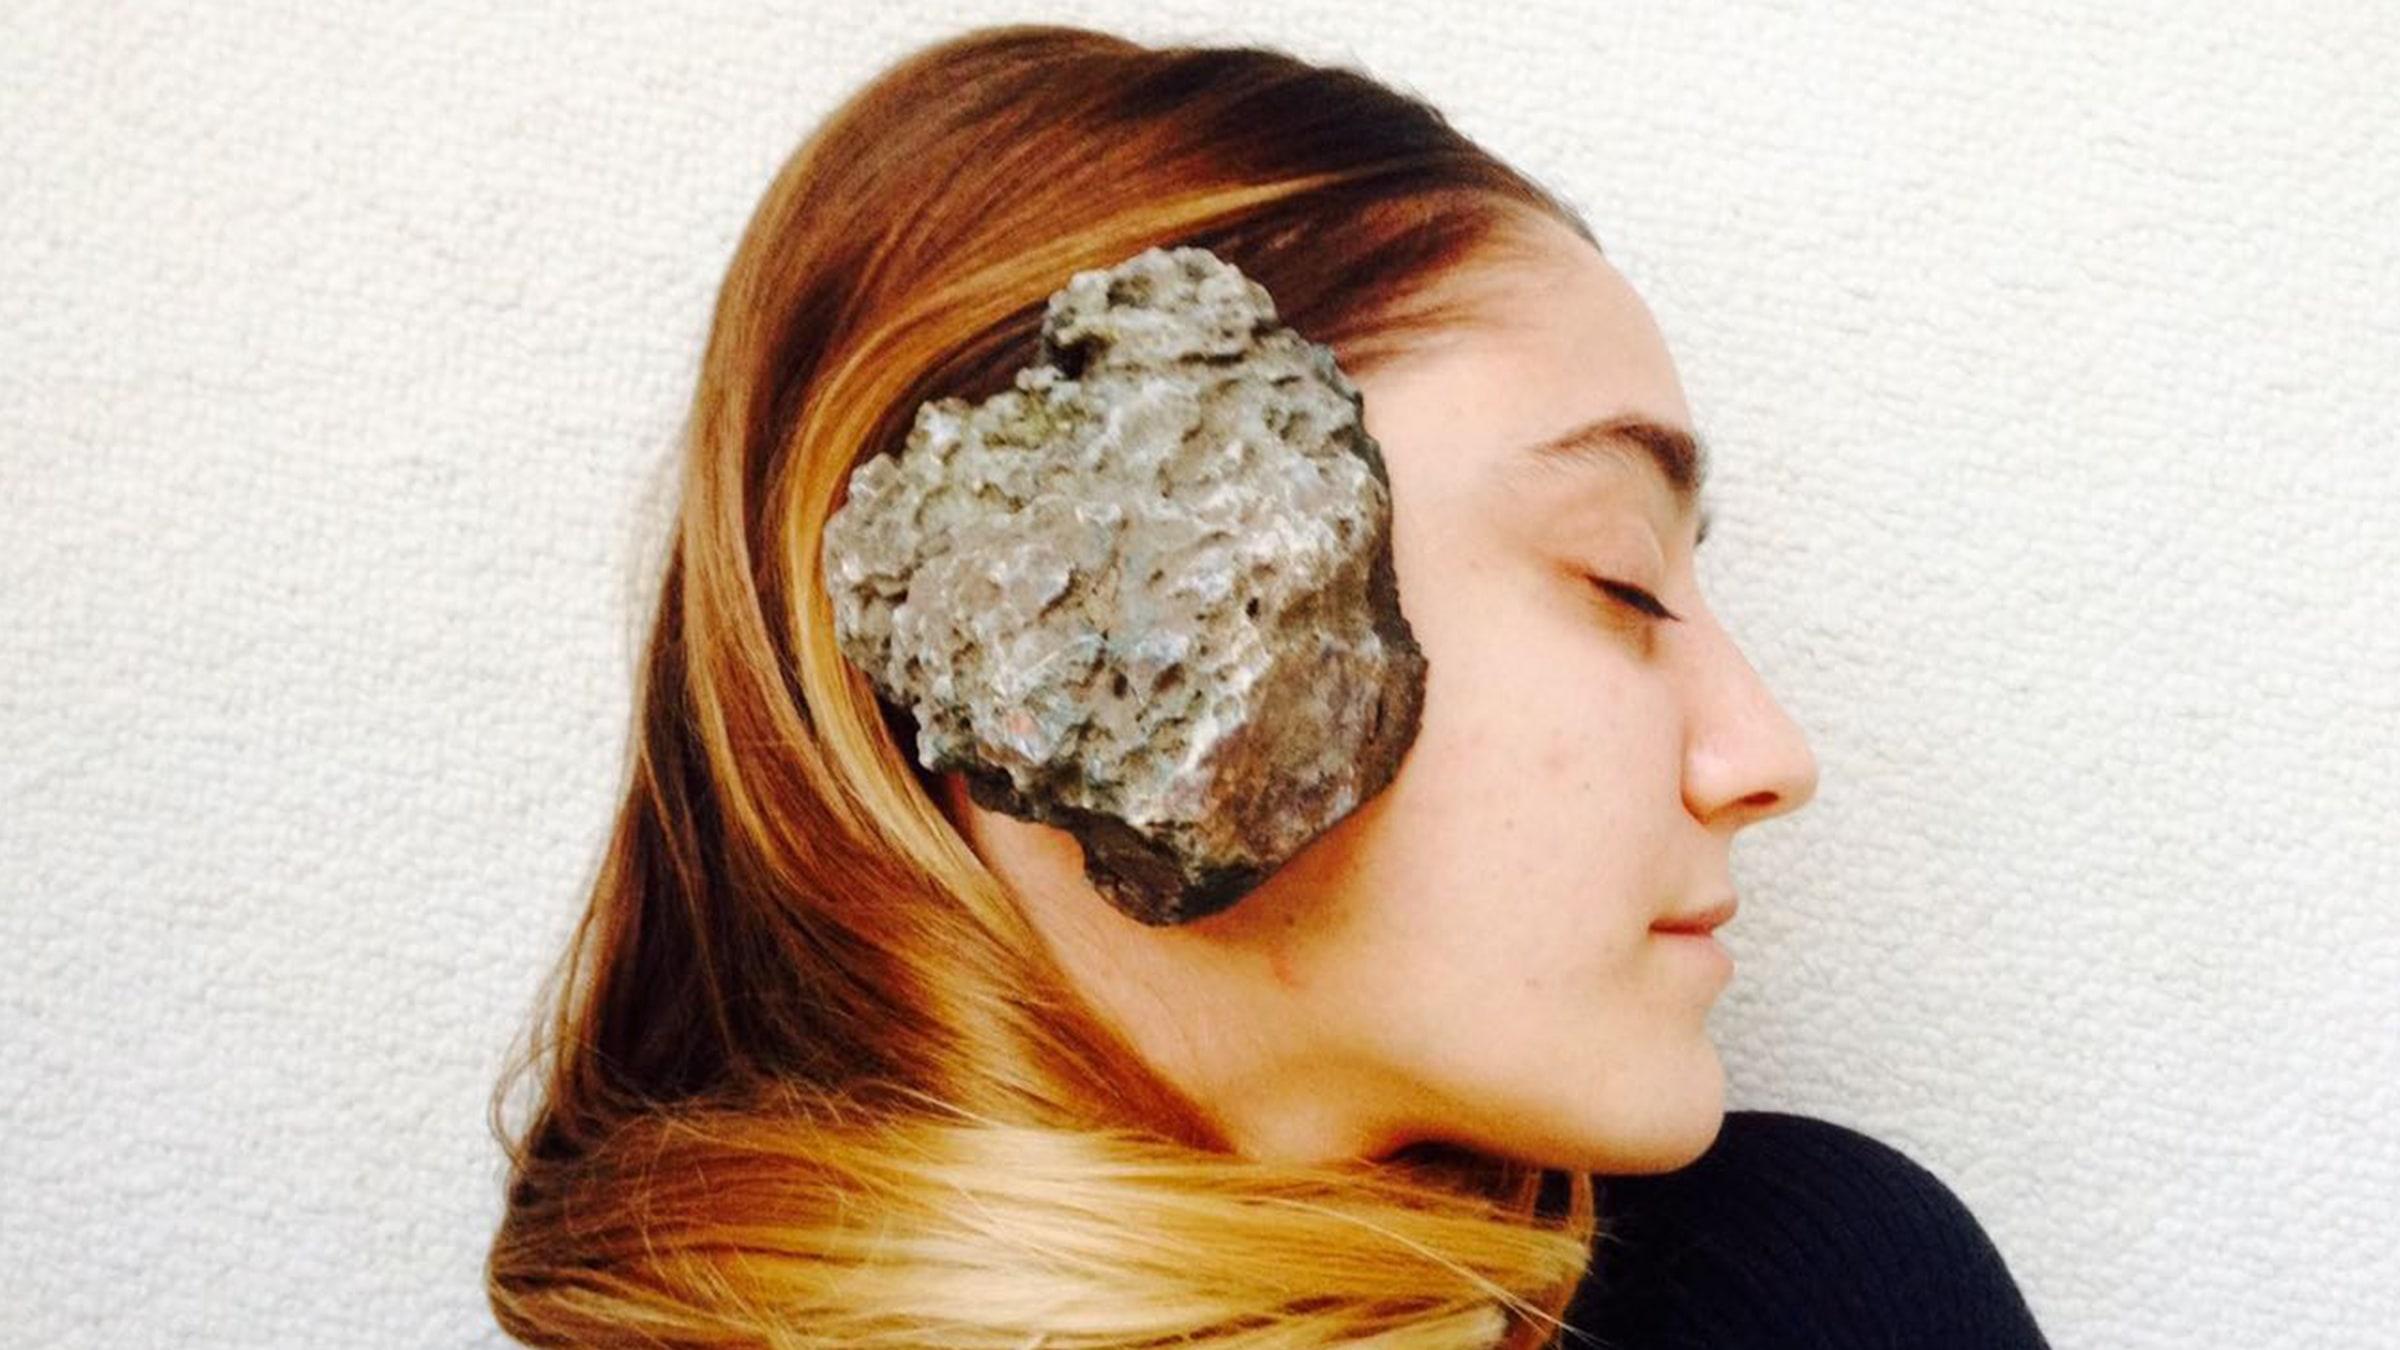 9 Stone, Ekin Bernay